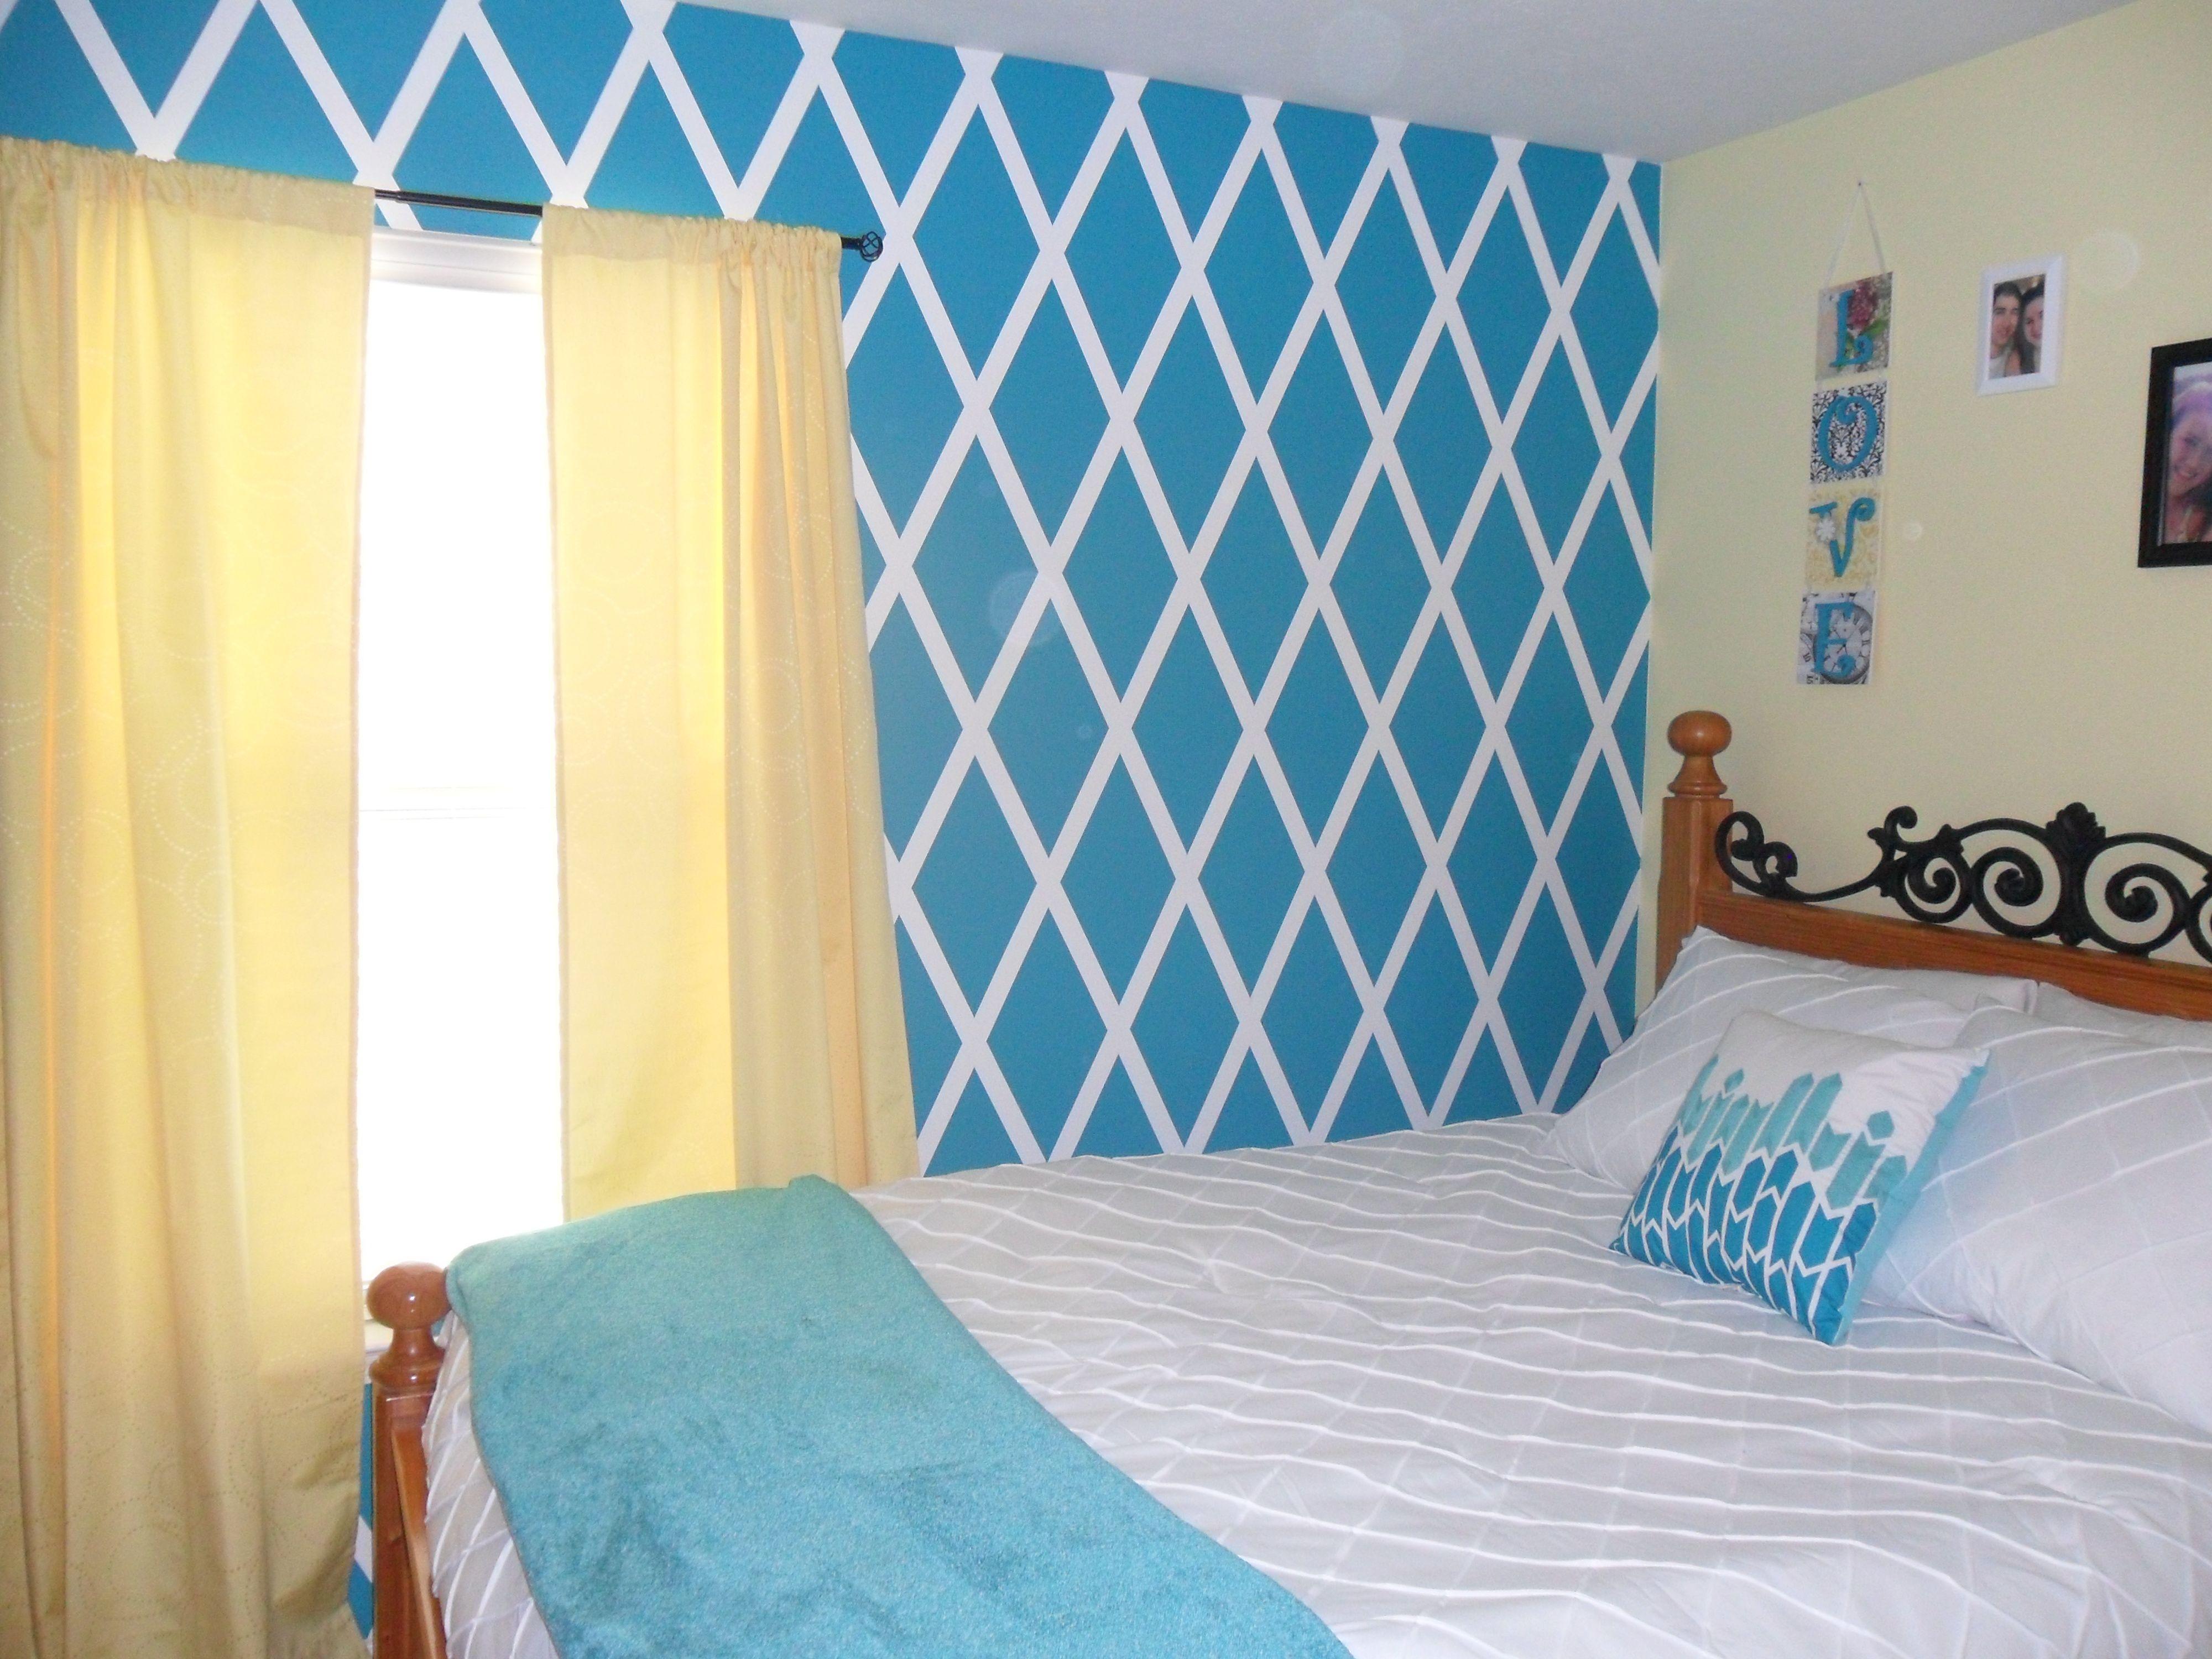 Pin By Amanda Withrow On Diy Decore Bedroom Wall Designs Bedroom Diy Diy Wall Painting